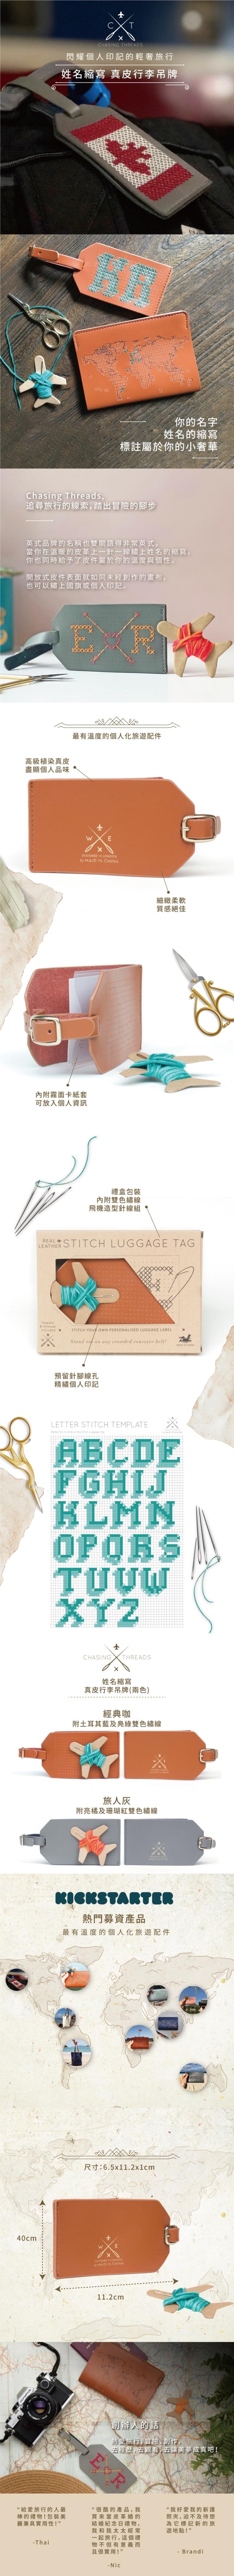 Chasing Threads|姓名縮寫 真皮行李吊牌 (經典咖)